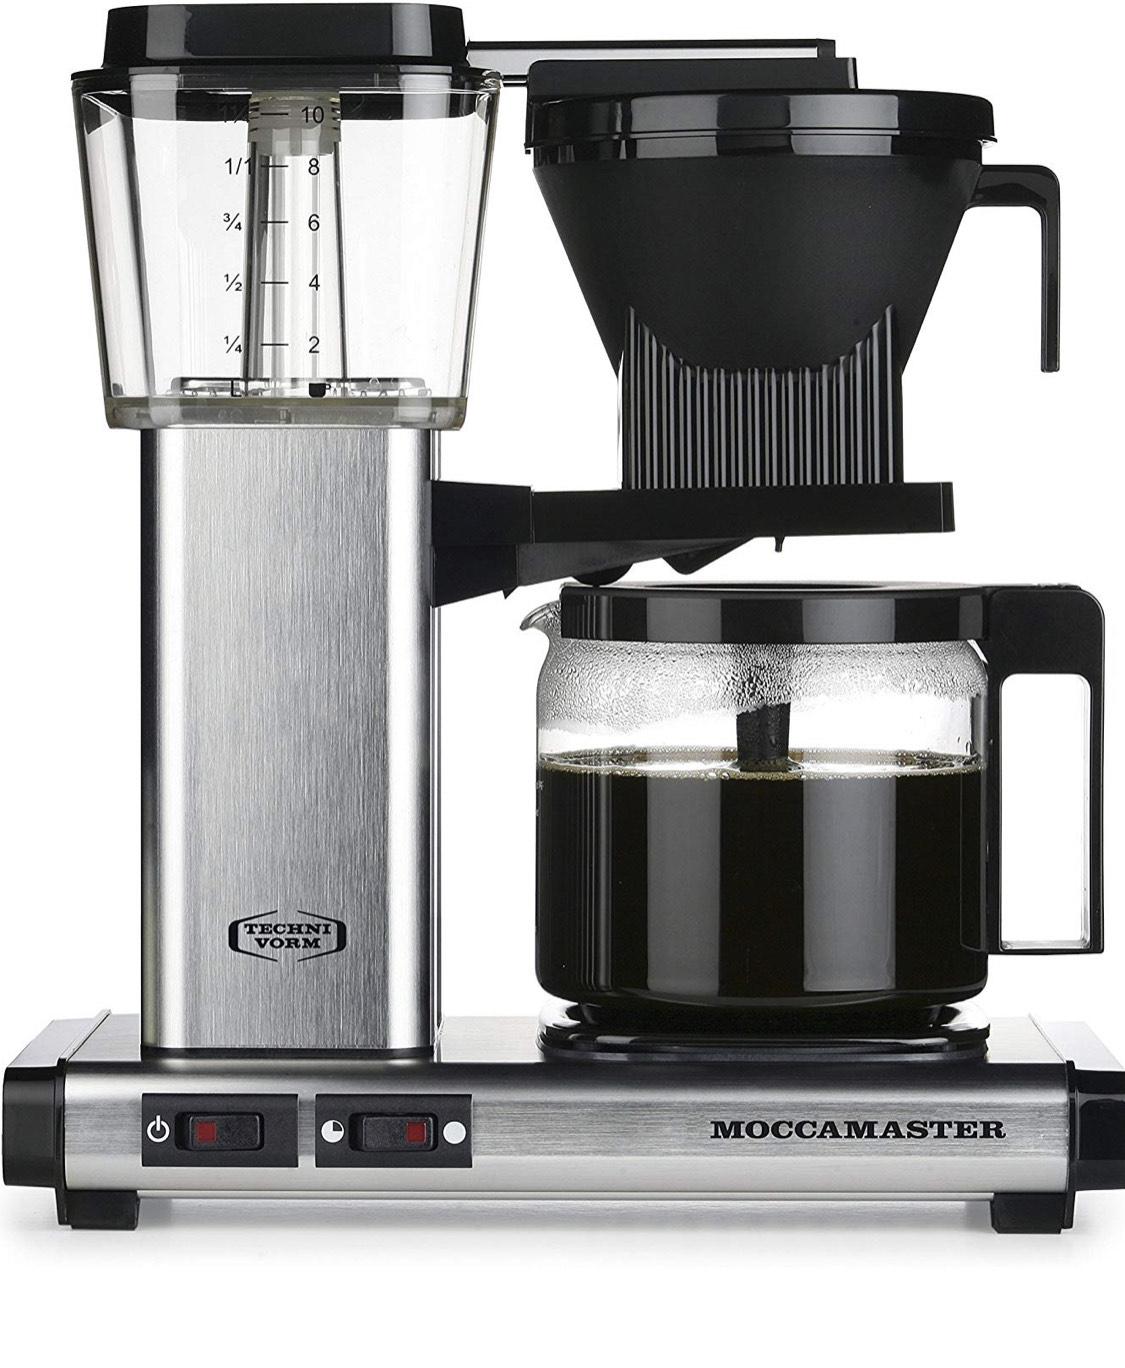 Koffiezetapparaat - Moccamaster KBG 741 @Amazon.de